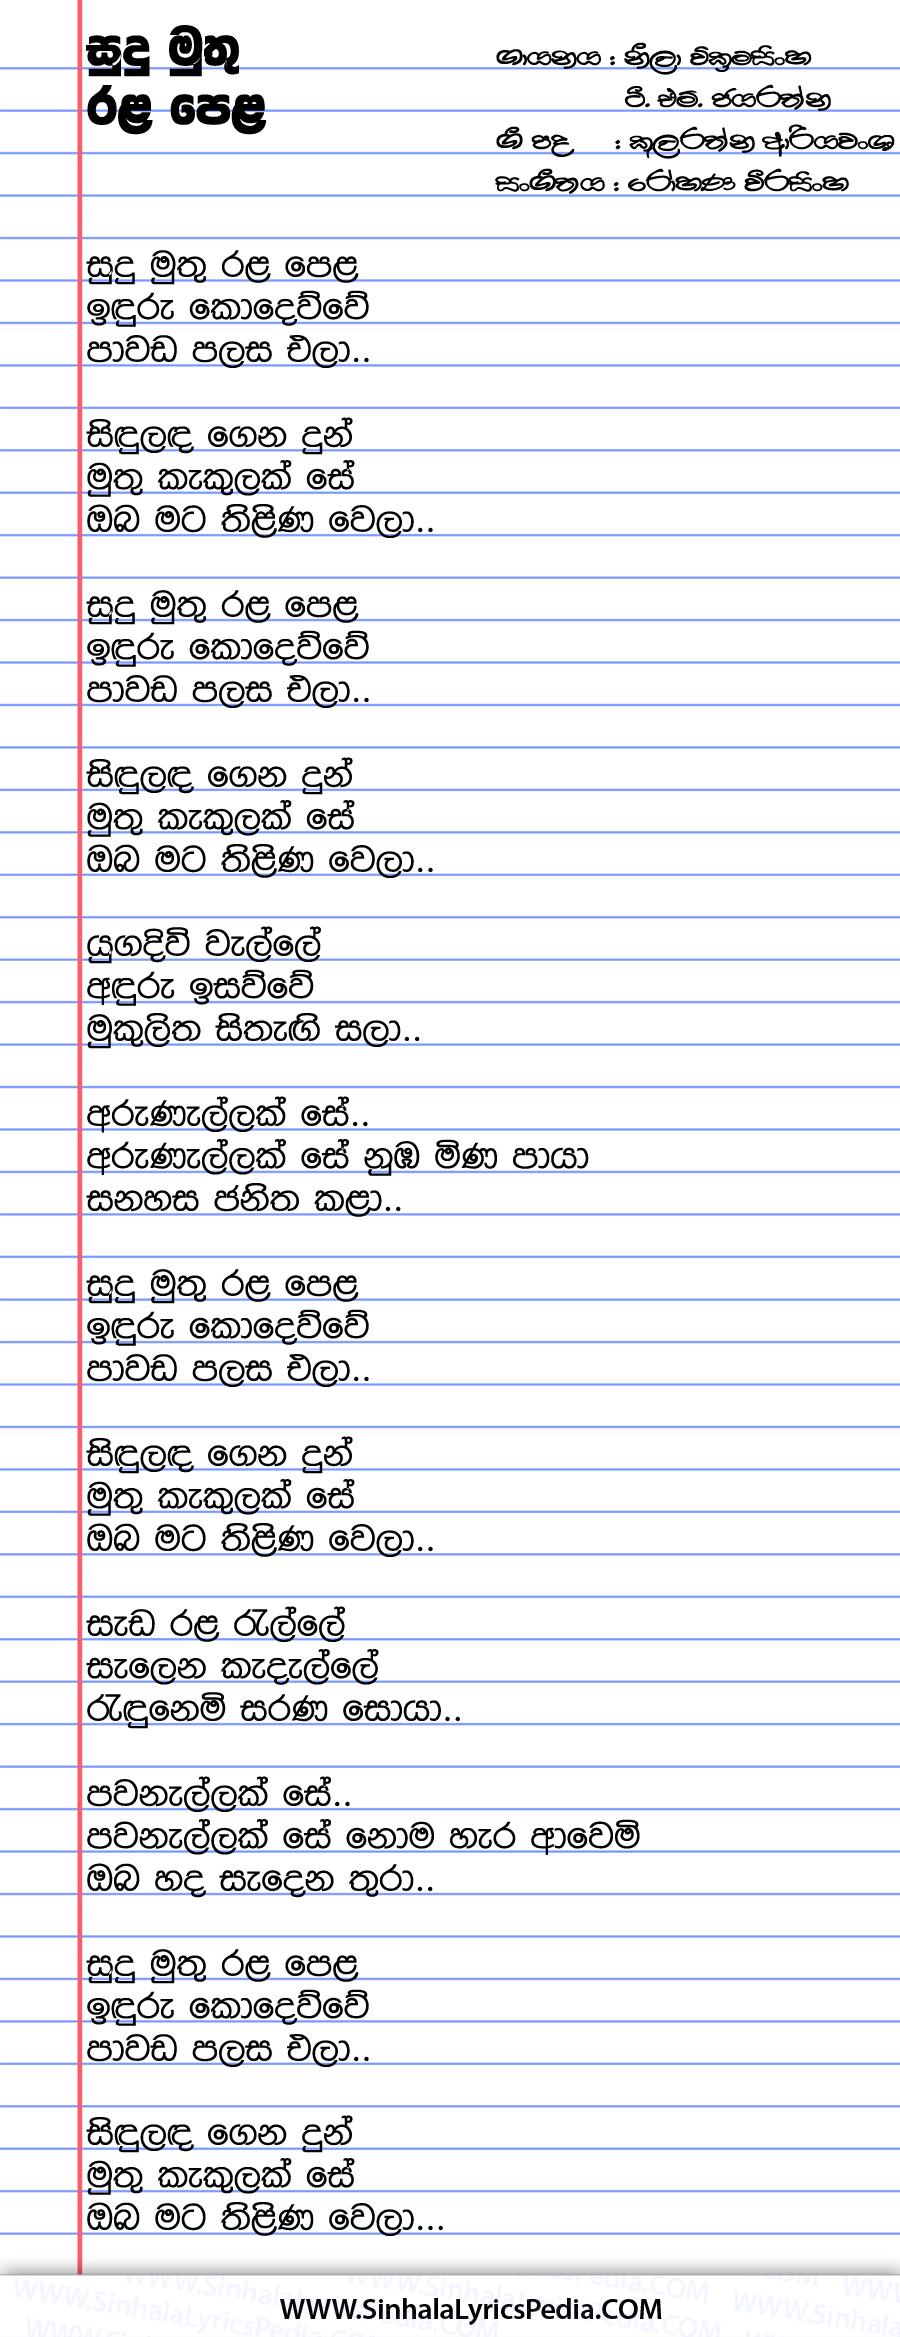 Sudu Muthu Rala Pela Song Lyrics